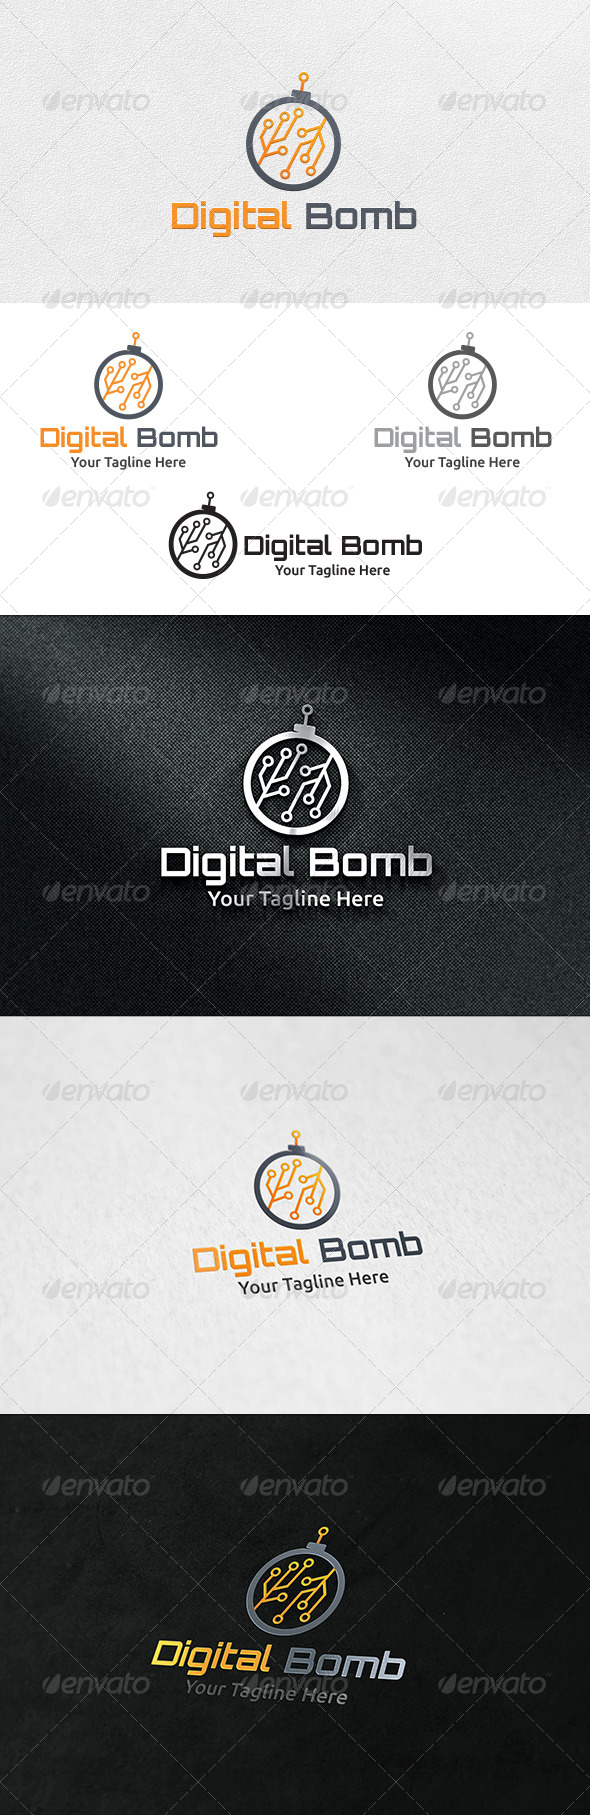 GraphicRiver Digital Bomb Logo Template 6636685